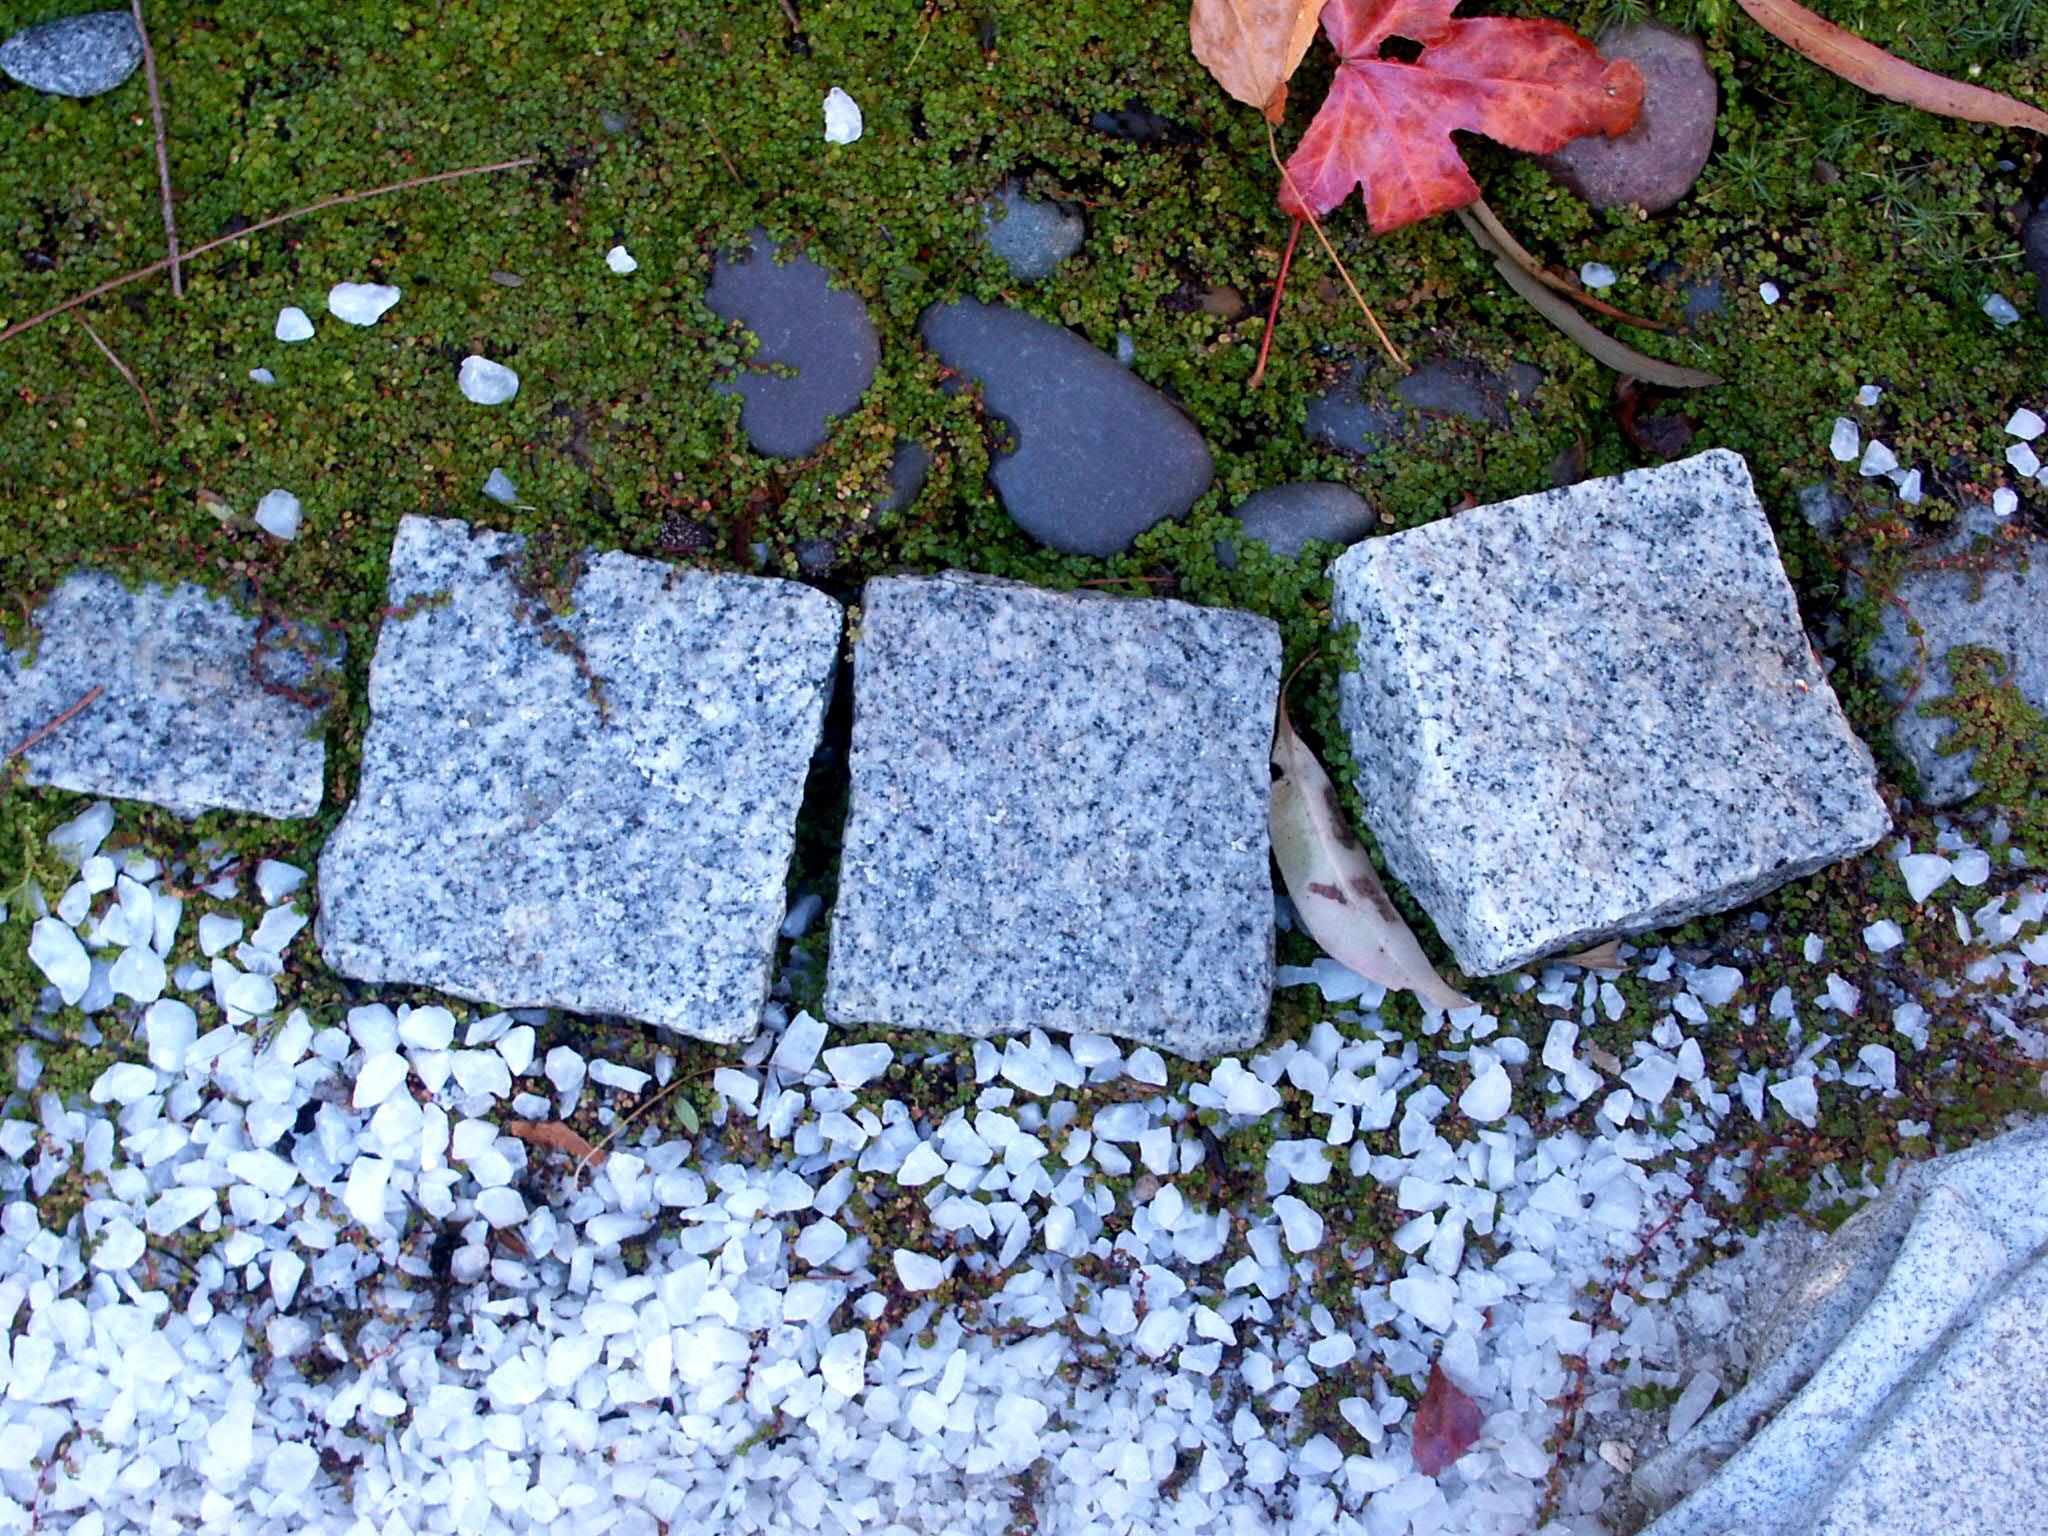 Cobblestone Granite 10x5x5cm $2.20 <br> 10x10x5 $3.50 <br> 15x15x5 $6